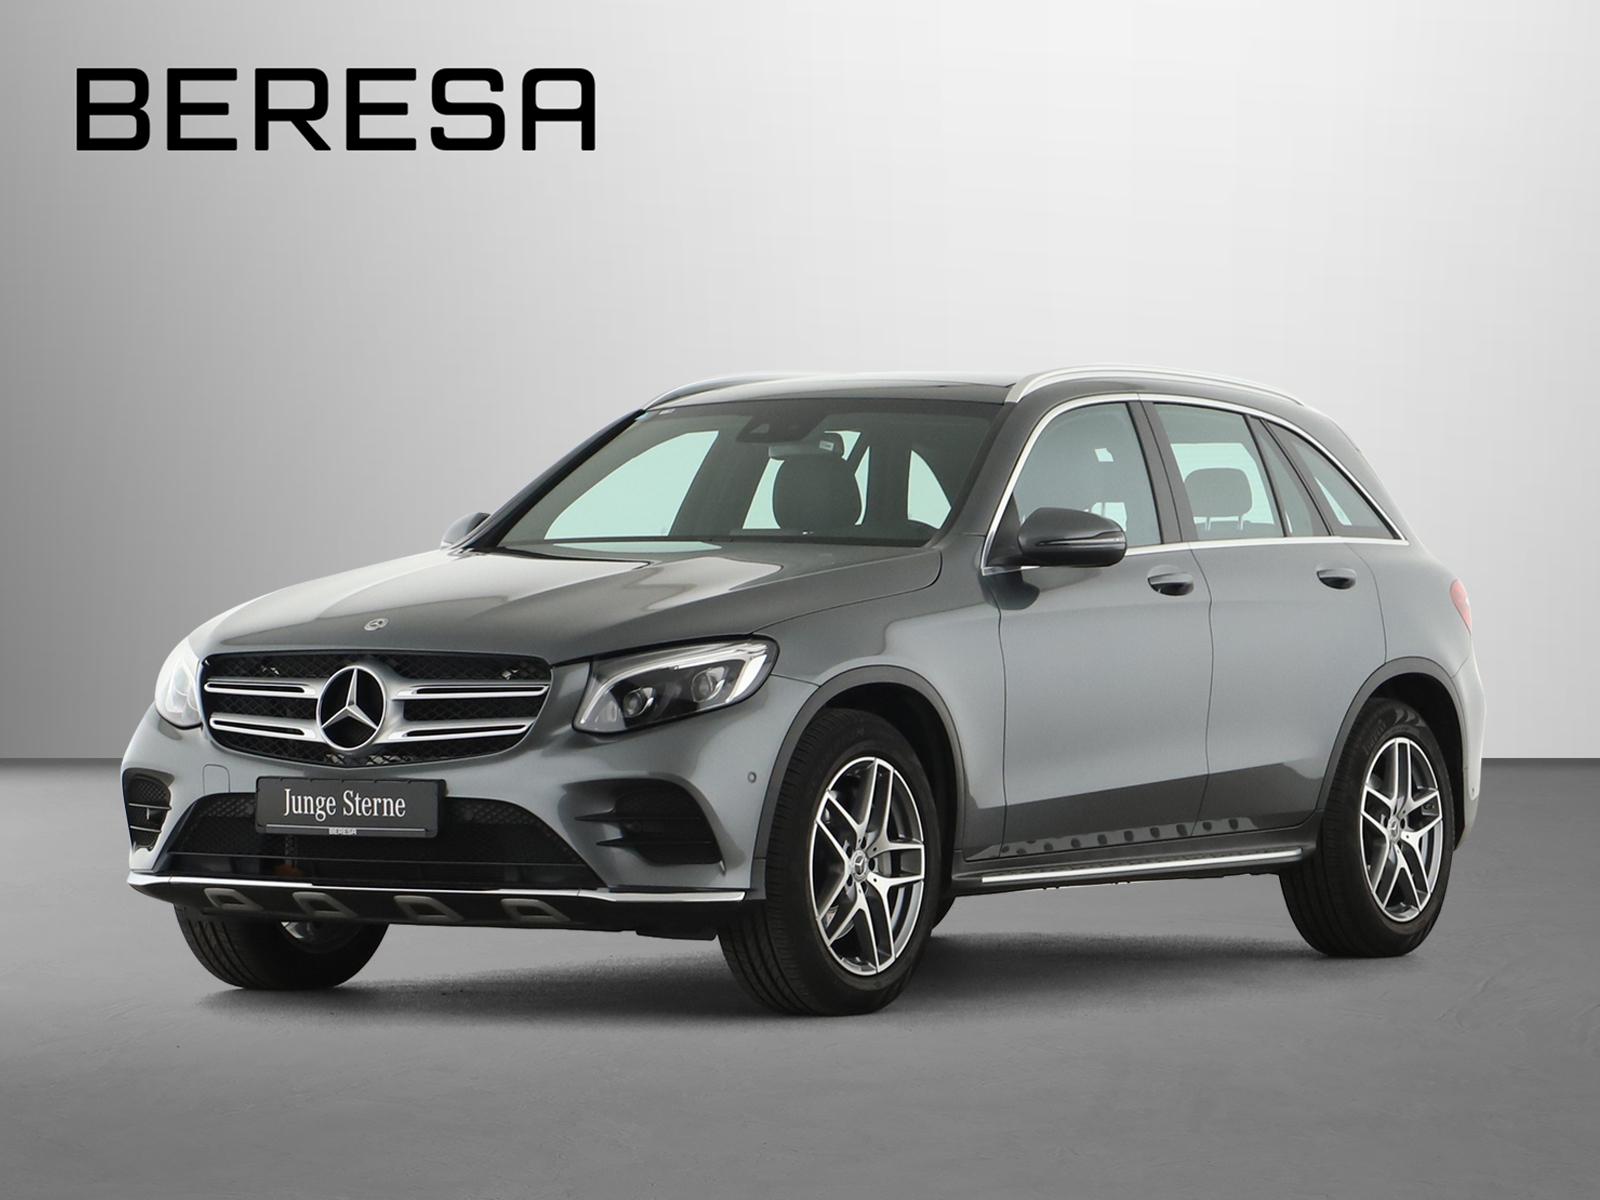 Mercedes-Benz GLC 300 4M AMG Pano.-Dach LED AHK Kamera Navi, Jahr 2018, Benzin